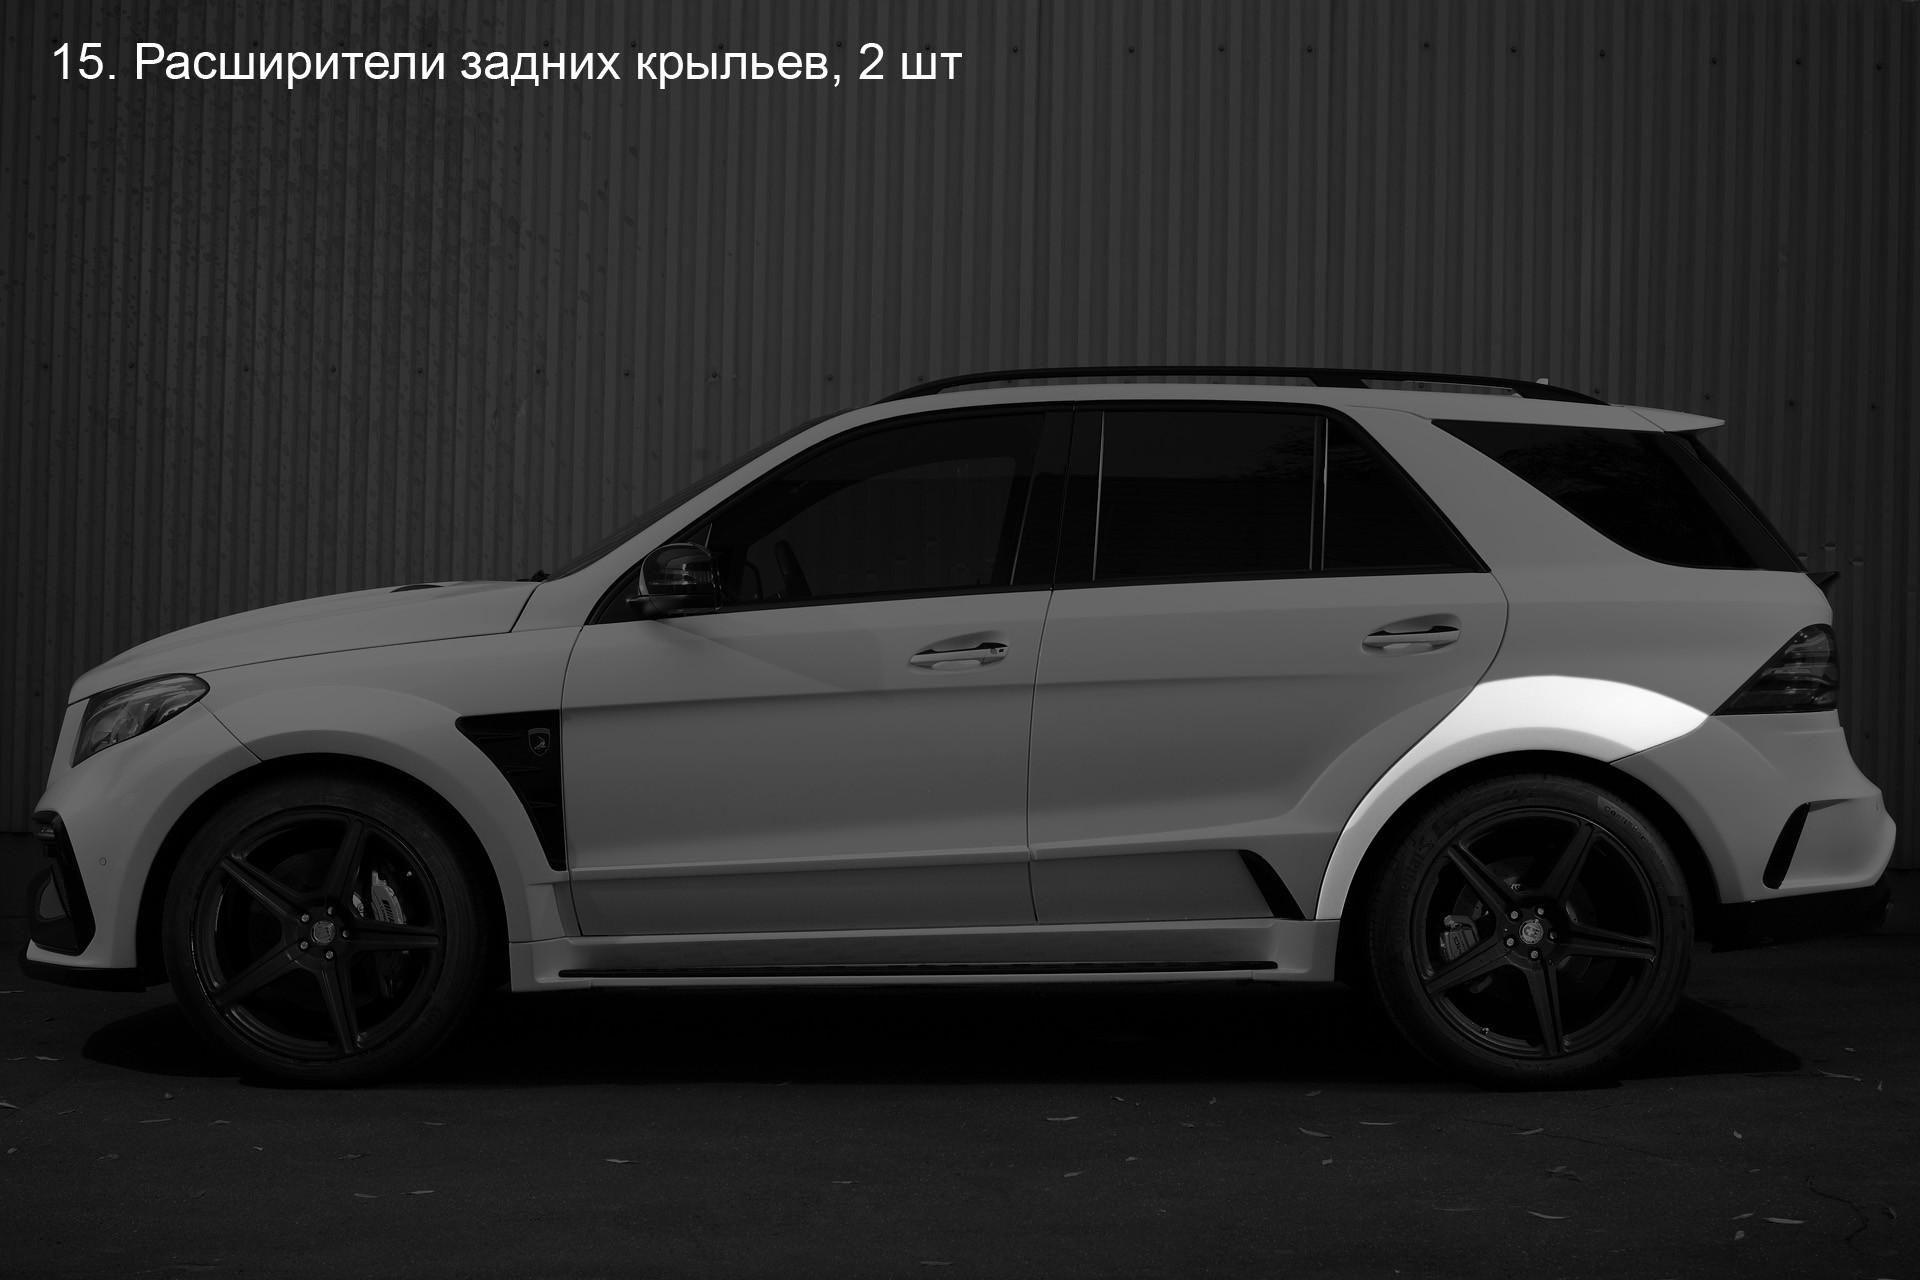 Обвес Topcar Design для Mercedes GLE wagon INFERNO